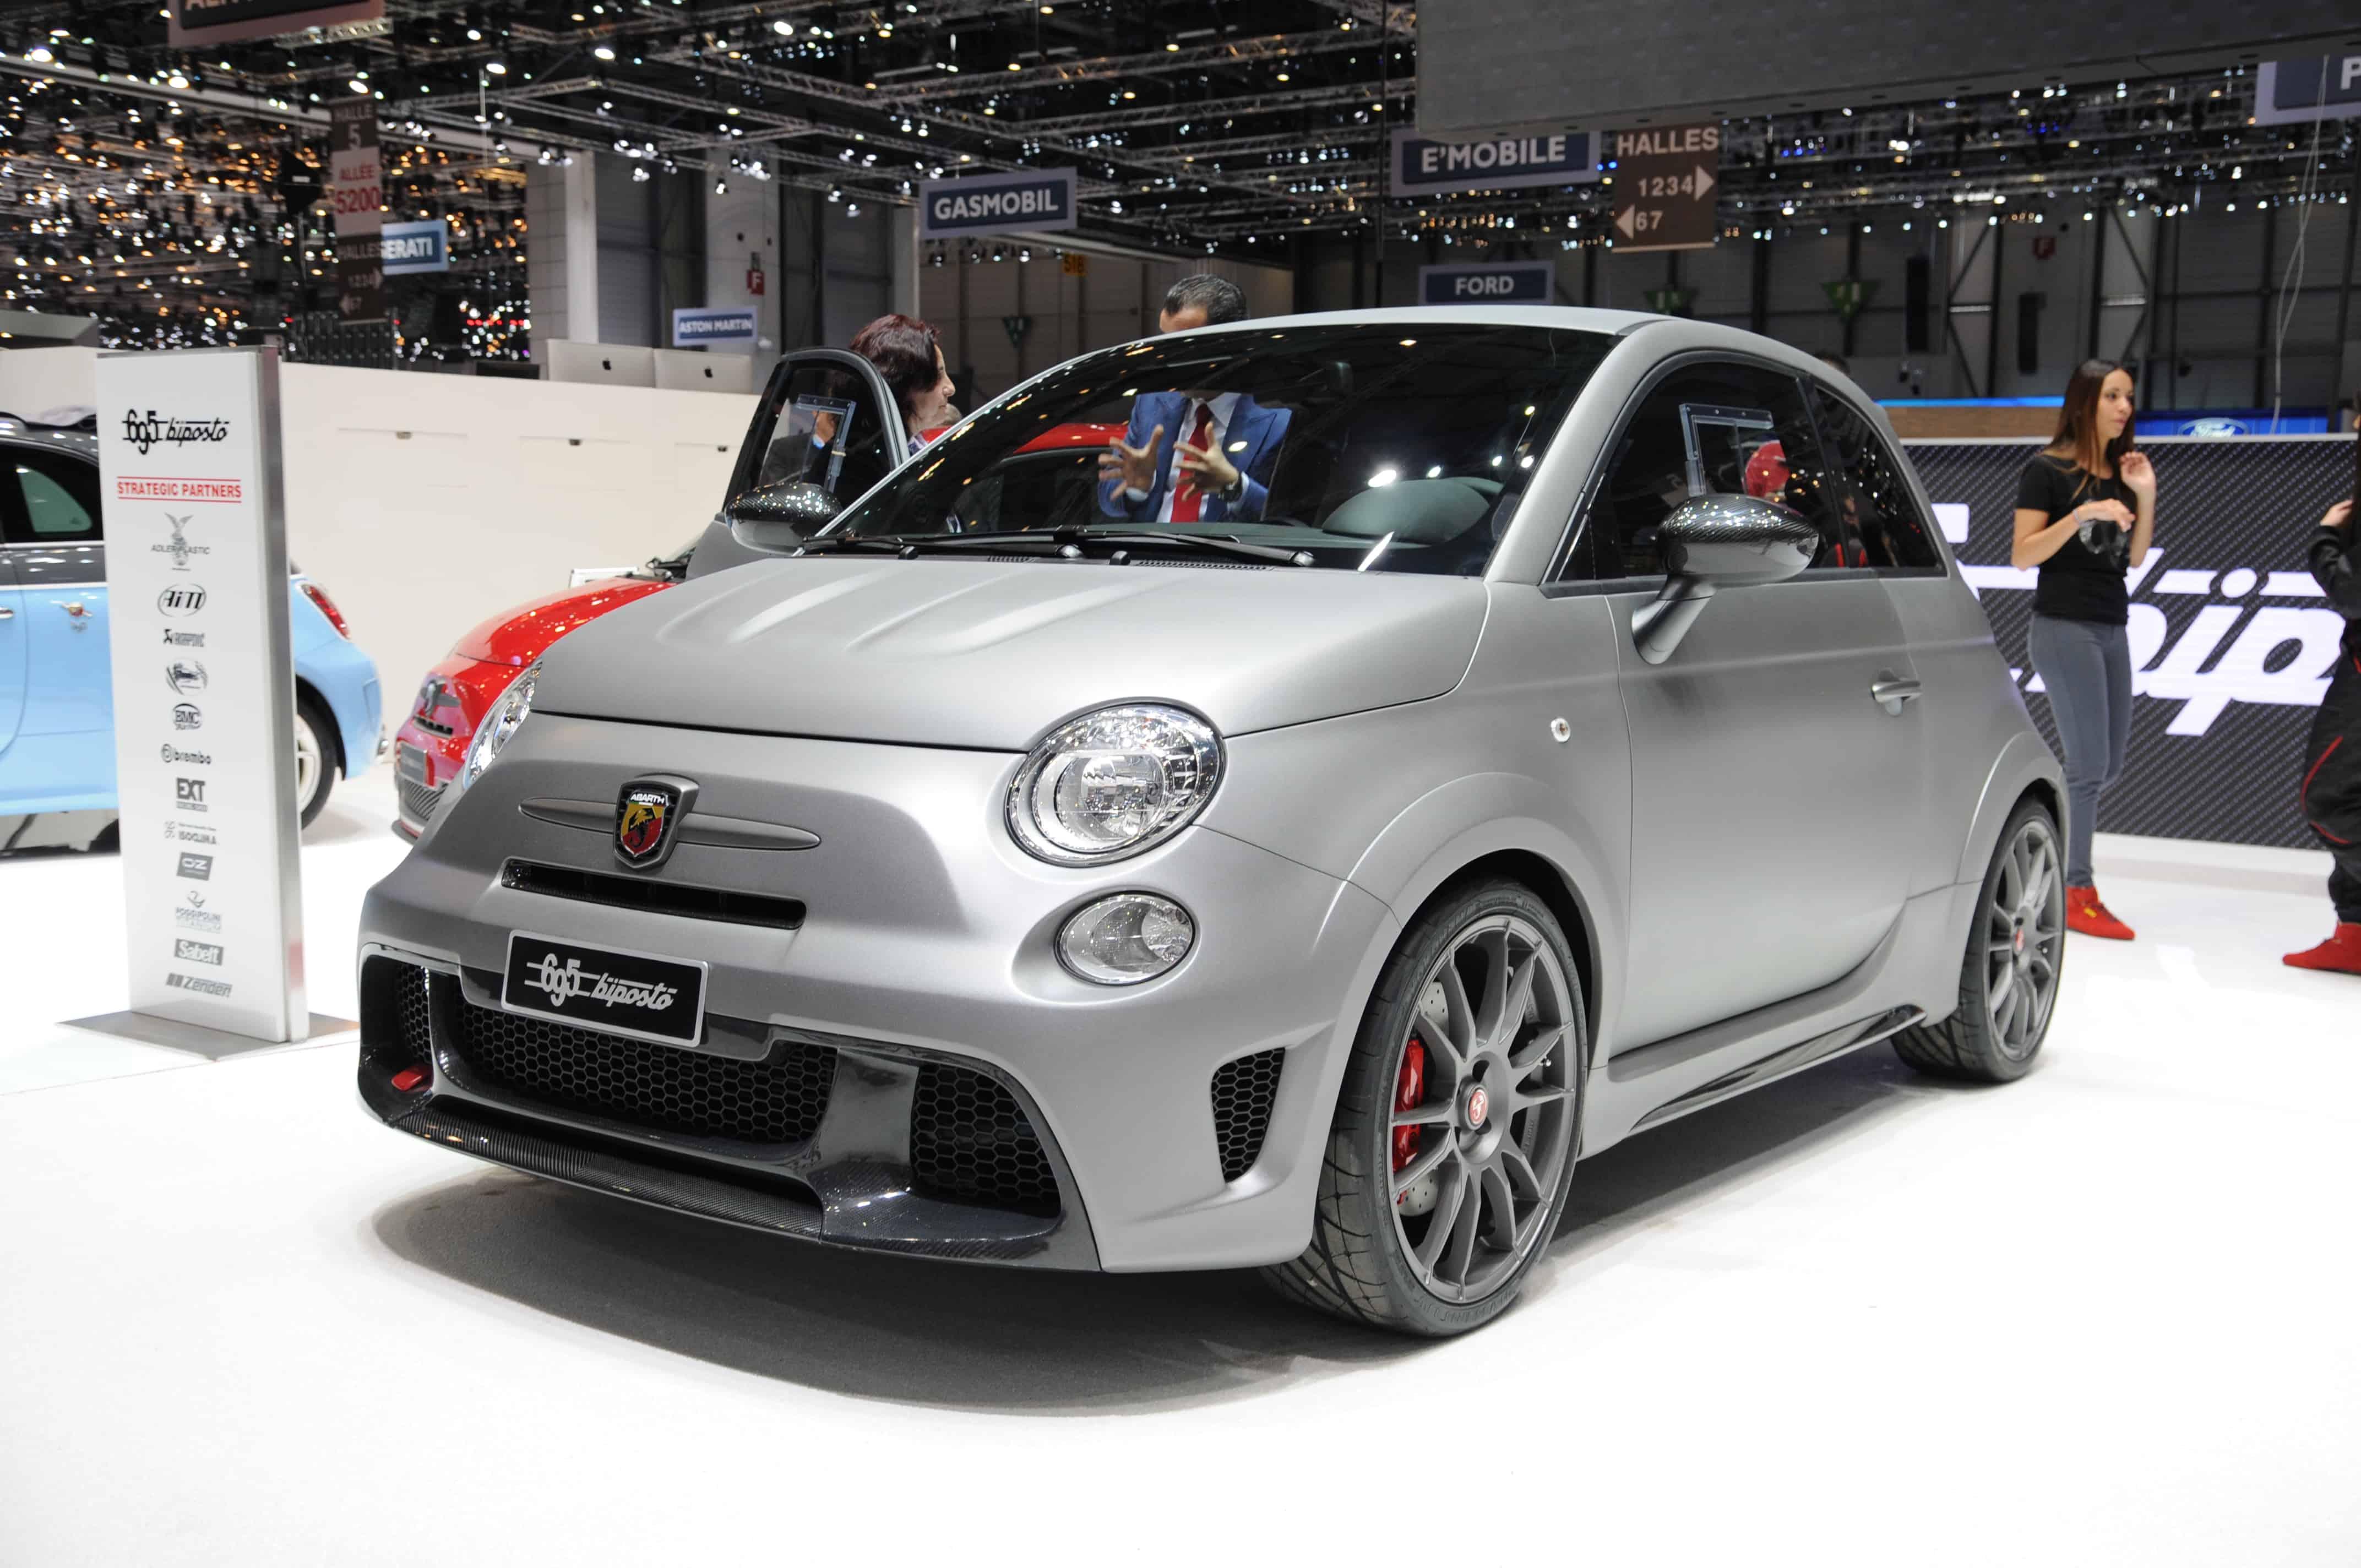 Fiat_500_Abarth_695_Biposto